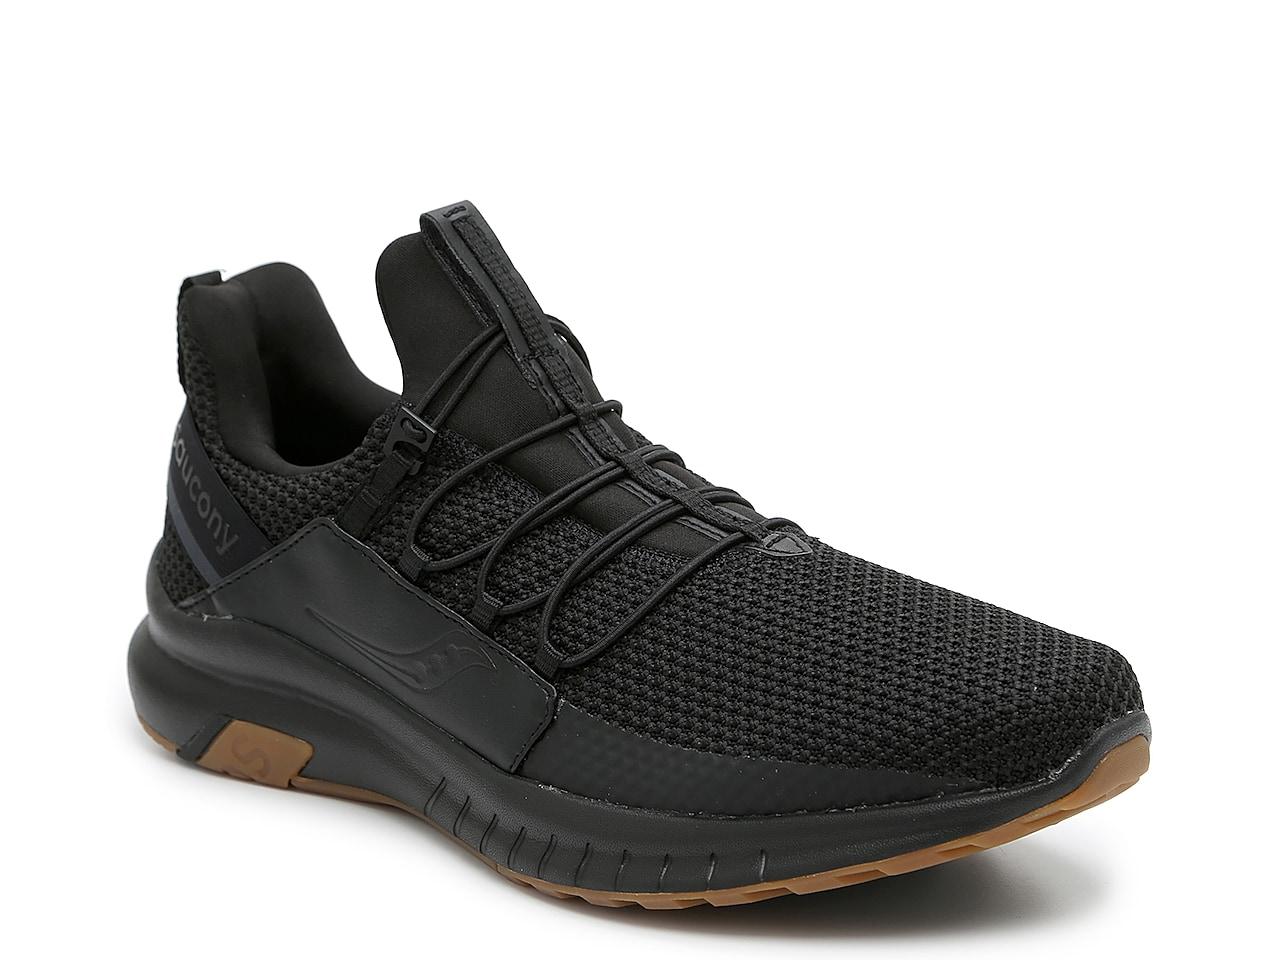 Saucony Stretch & Go Glide Slip-On Running Shoe - Men's